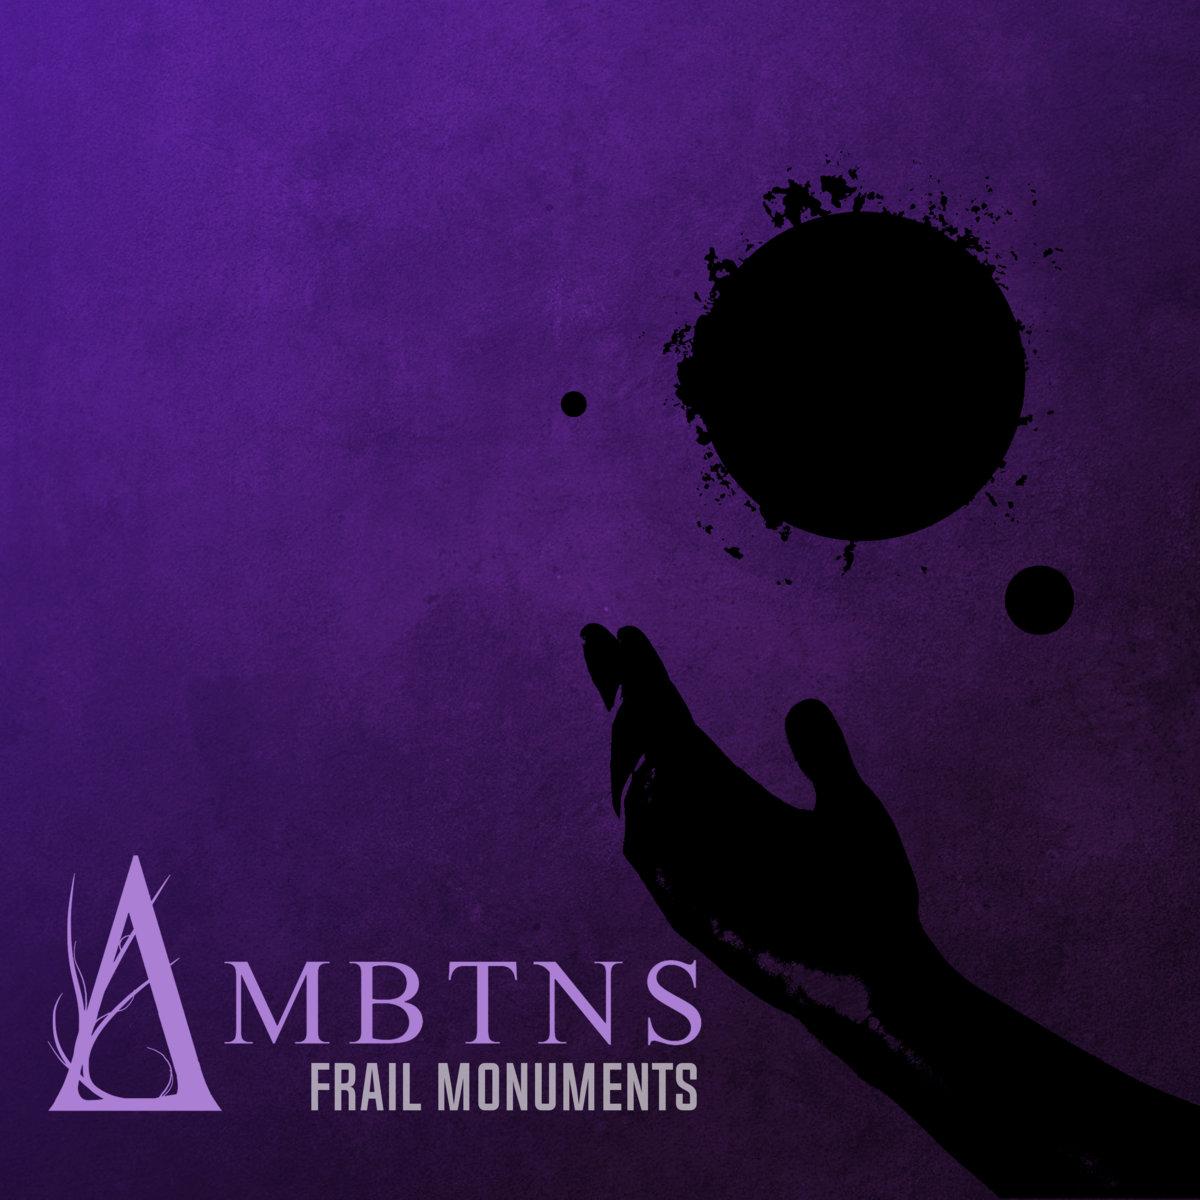 AMBTNS. - Frail Monuments [EP] (2018)